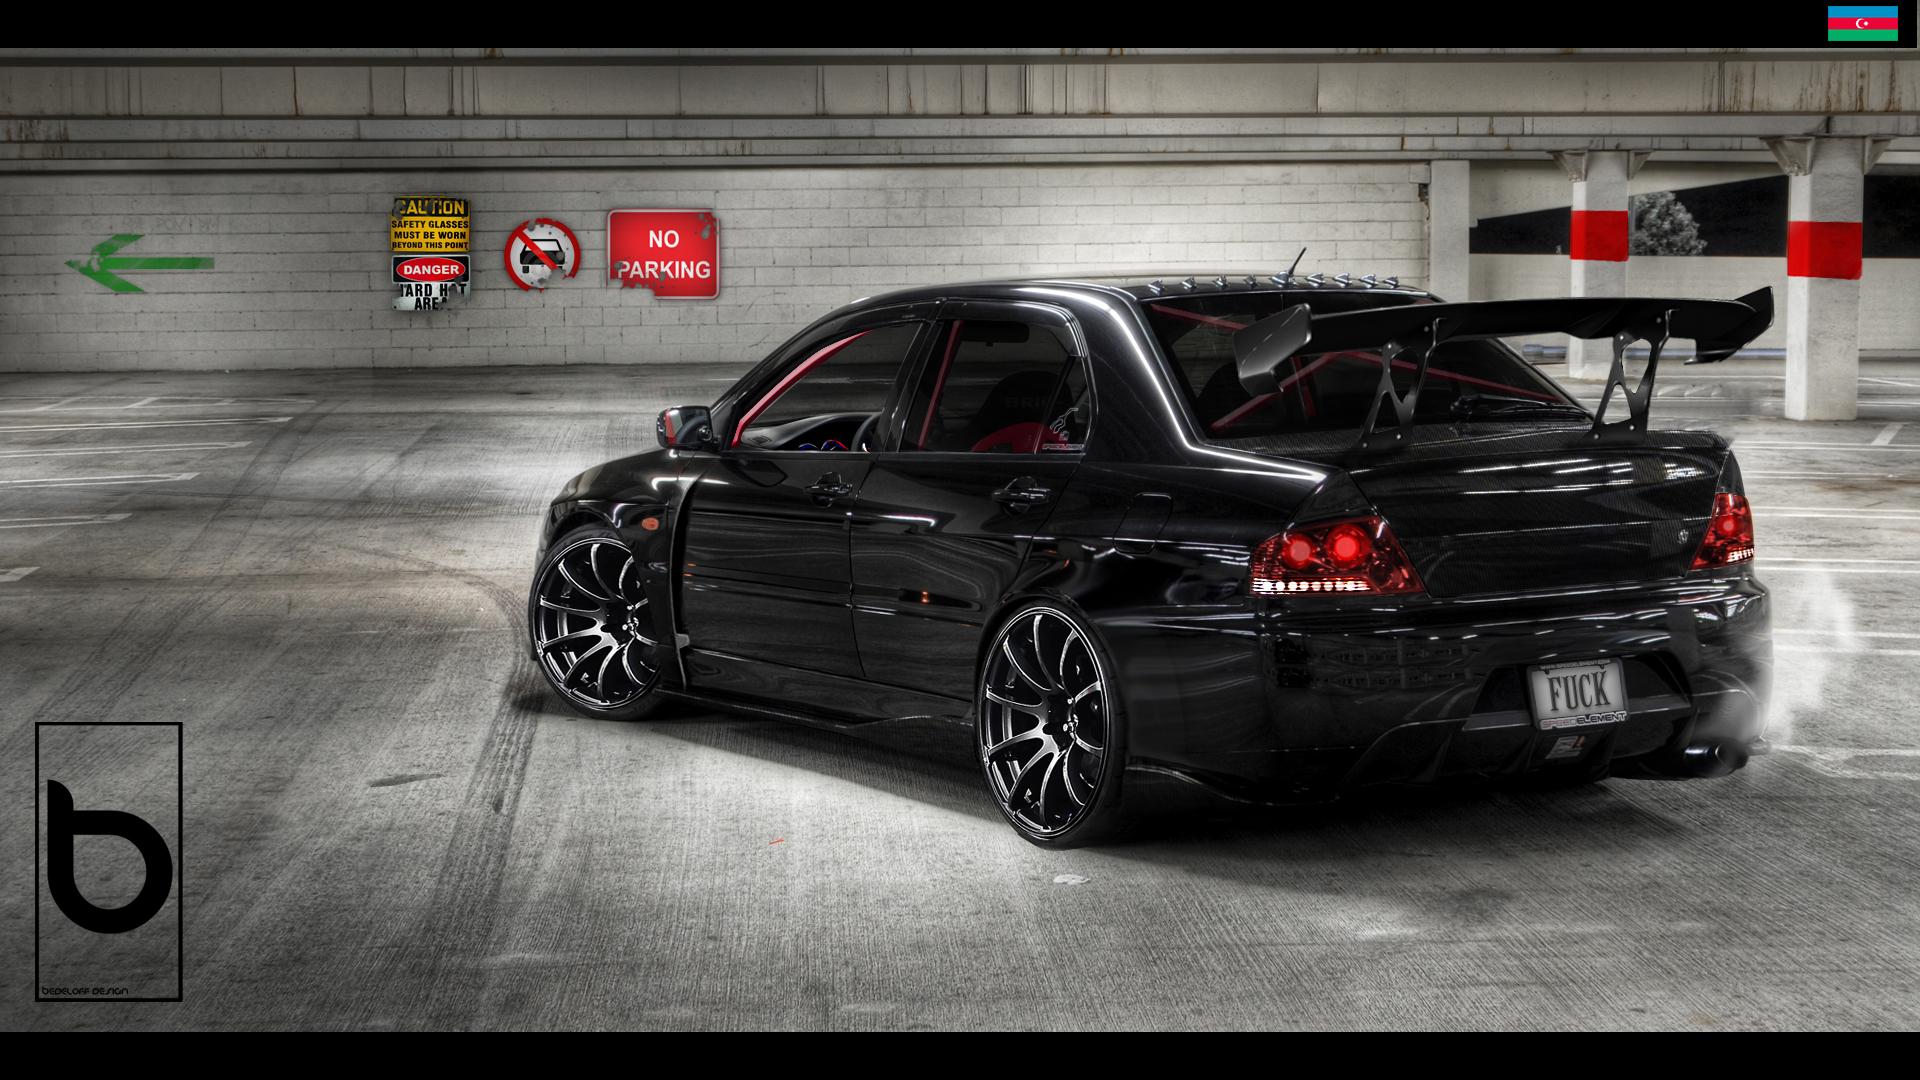 Mitsubishi_Lancer by Bedeloff